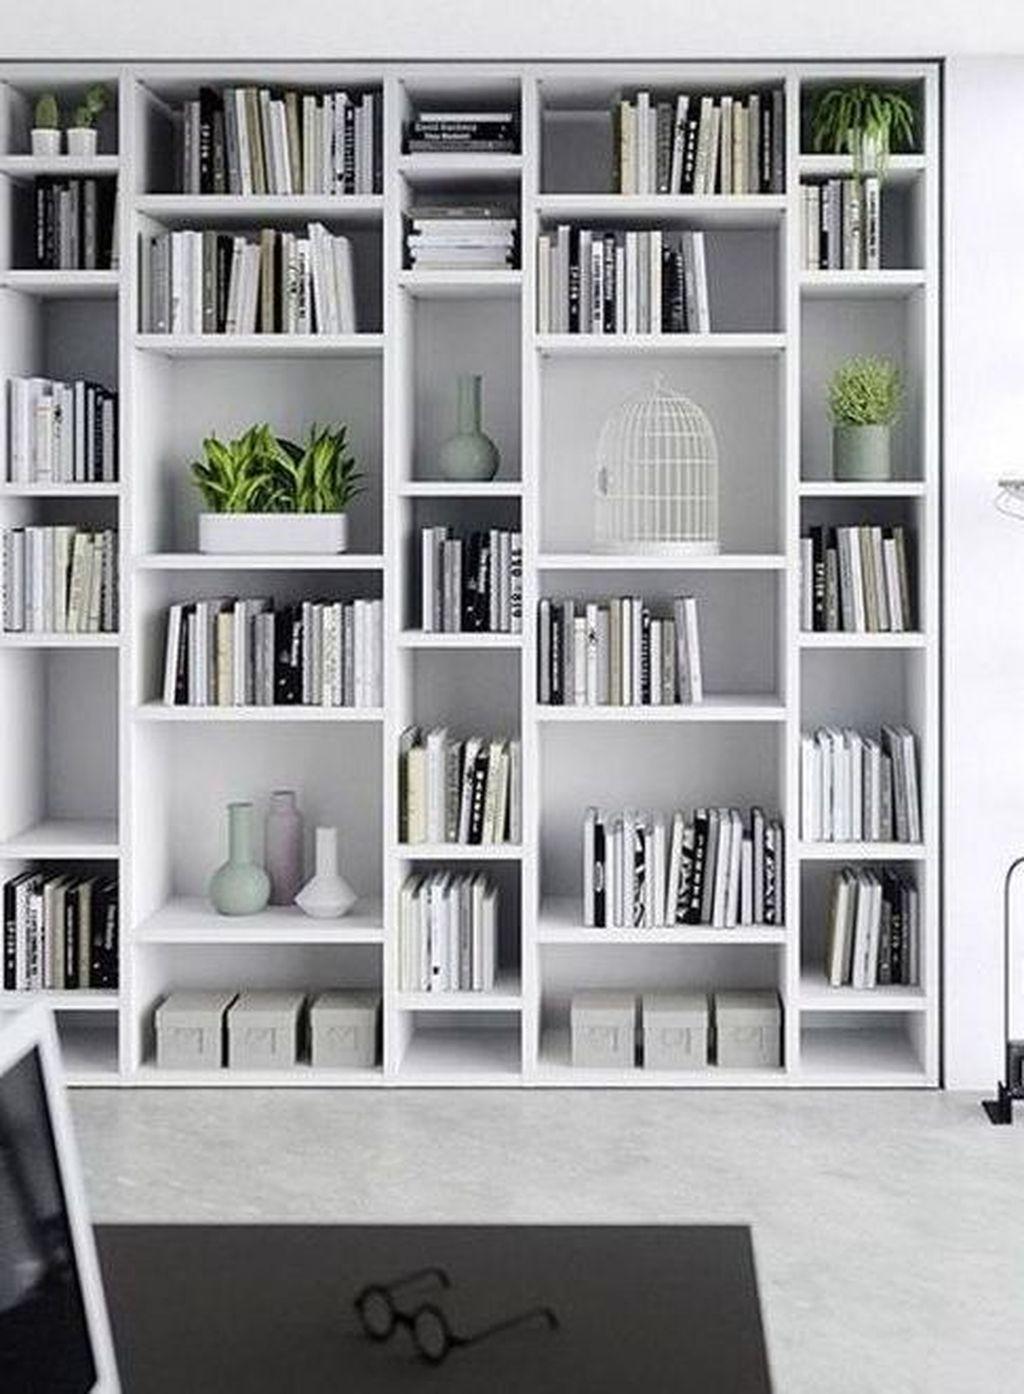 32 Stunning Bookshelf Design Ideas For A Minimalist Home That You Should Try In 2020 Bibliothek Zu Hause Wohnung Bucherregal Ideen